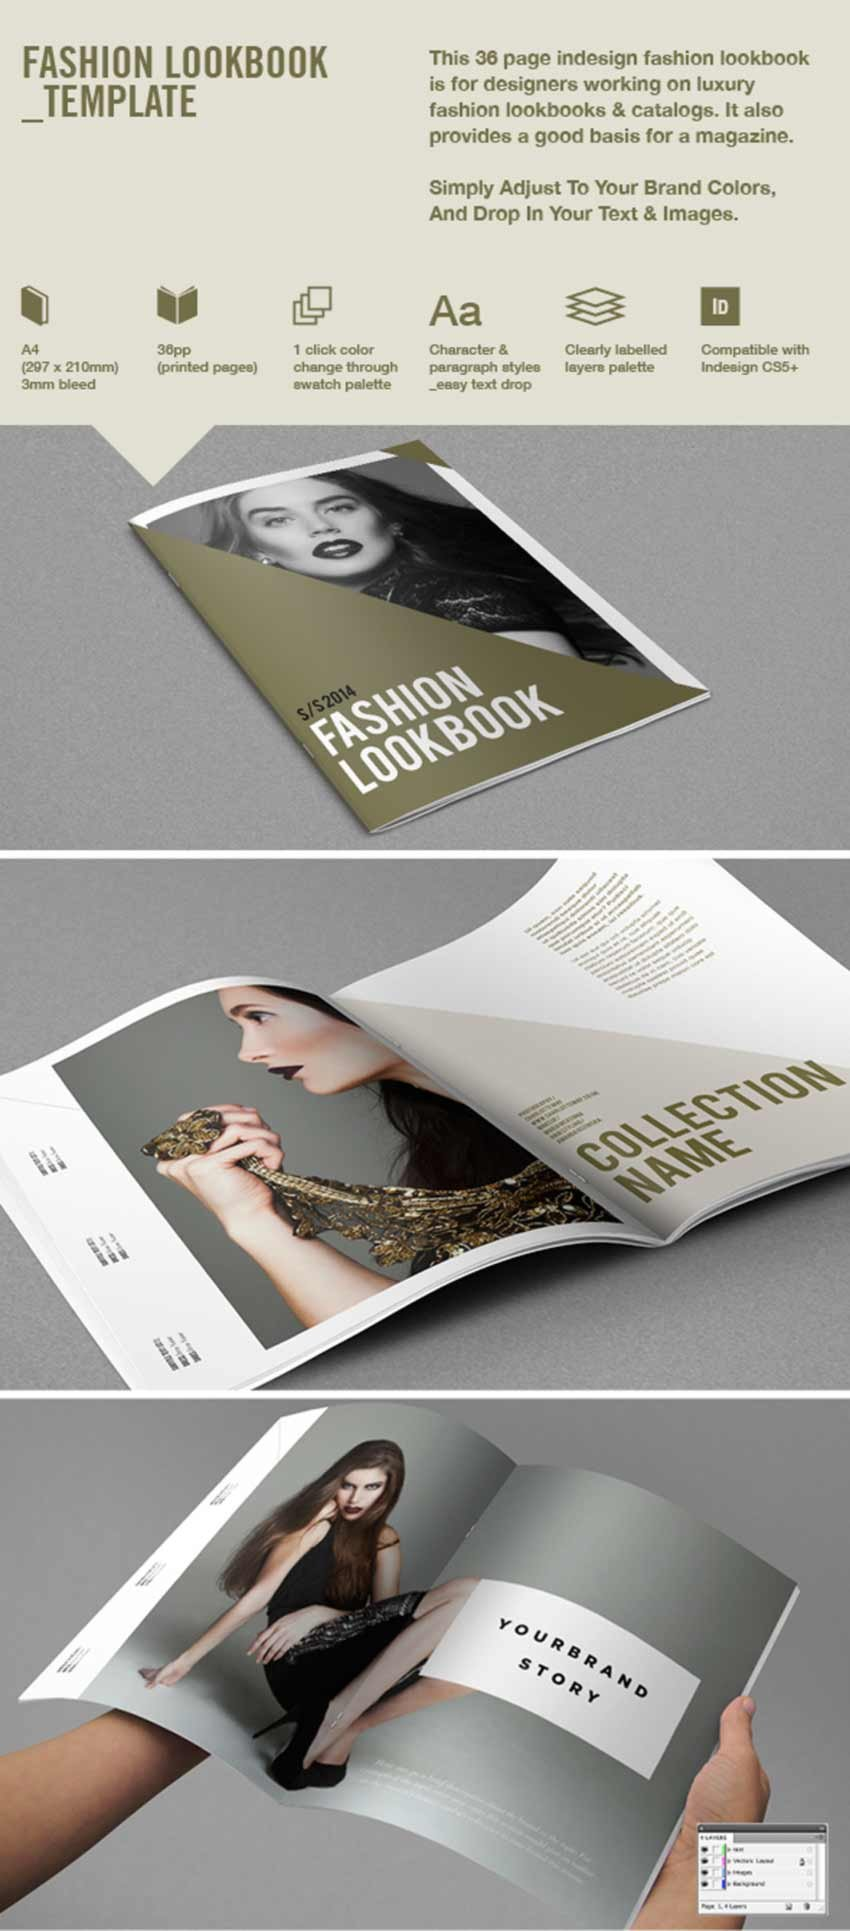 Fashion Product Lookbook Template